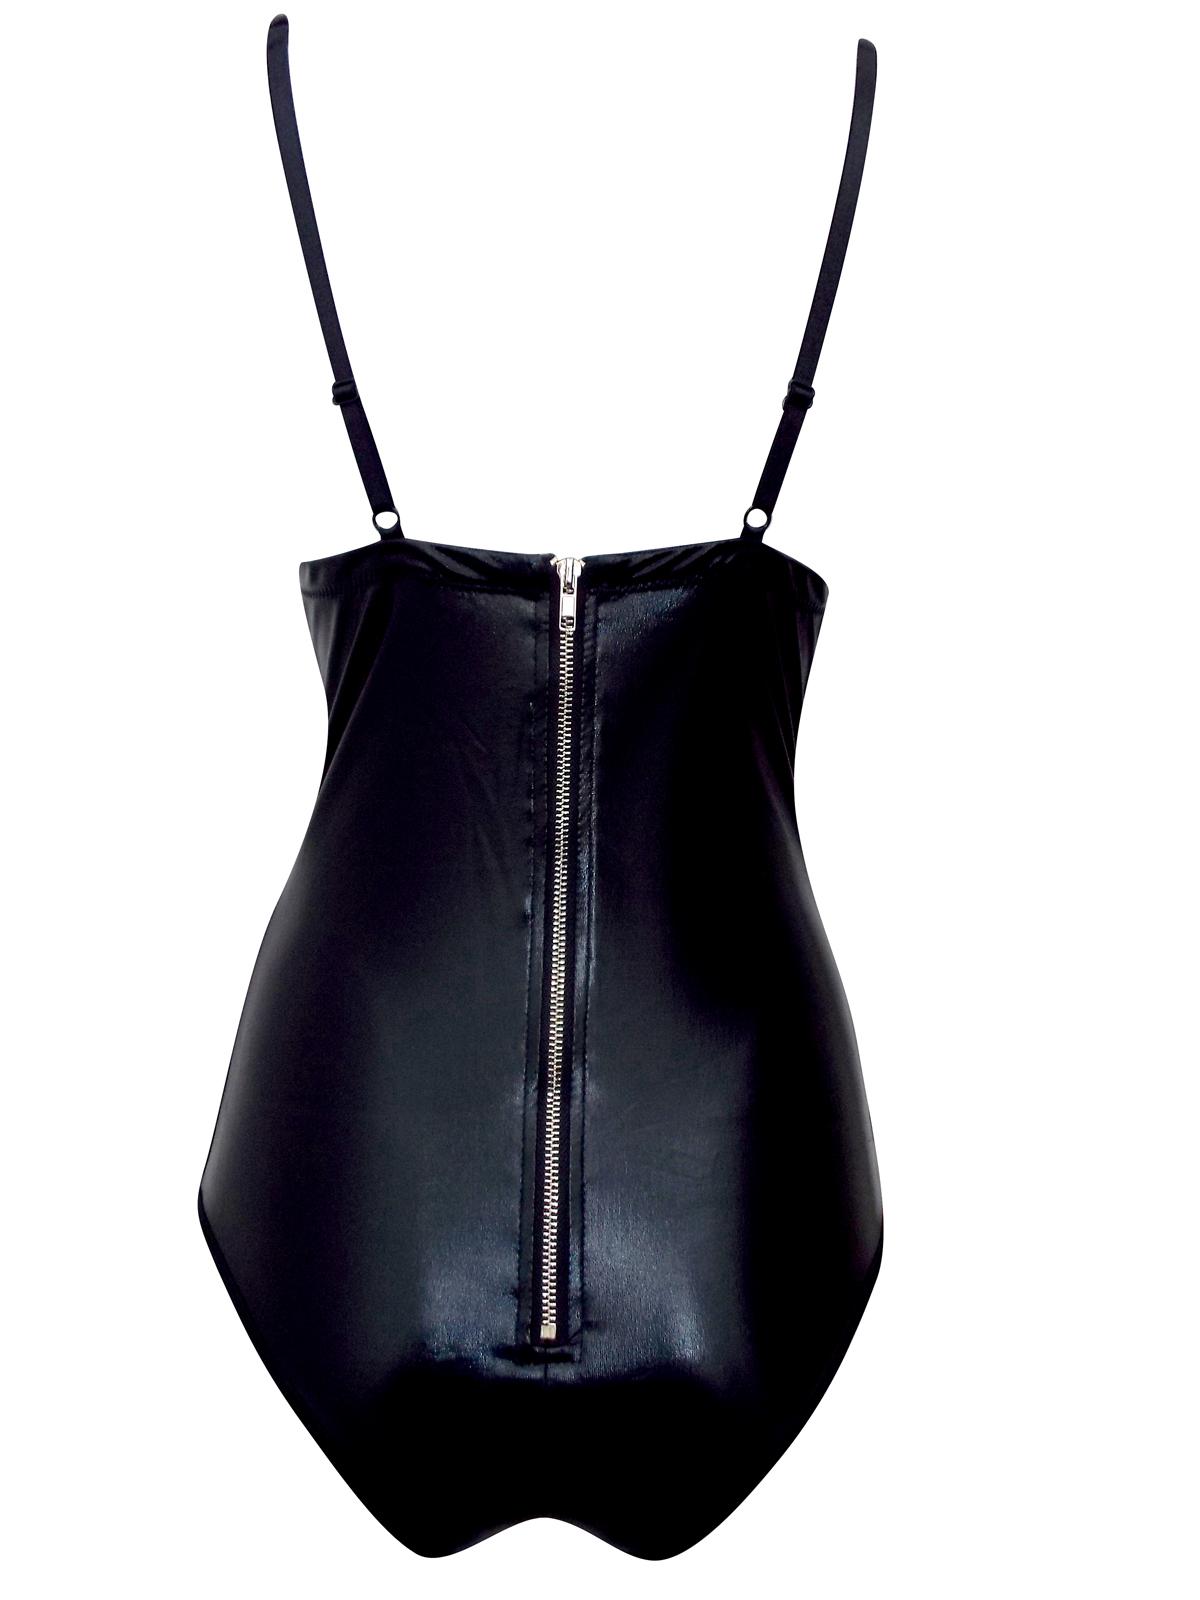 289206211d97 Ann Summers - - Ann Summers SHARI BLACK Wet Look Laced-Up PVC Bodysuit -  Size 10